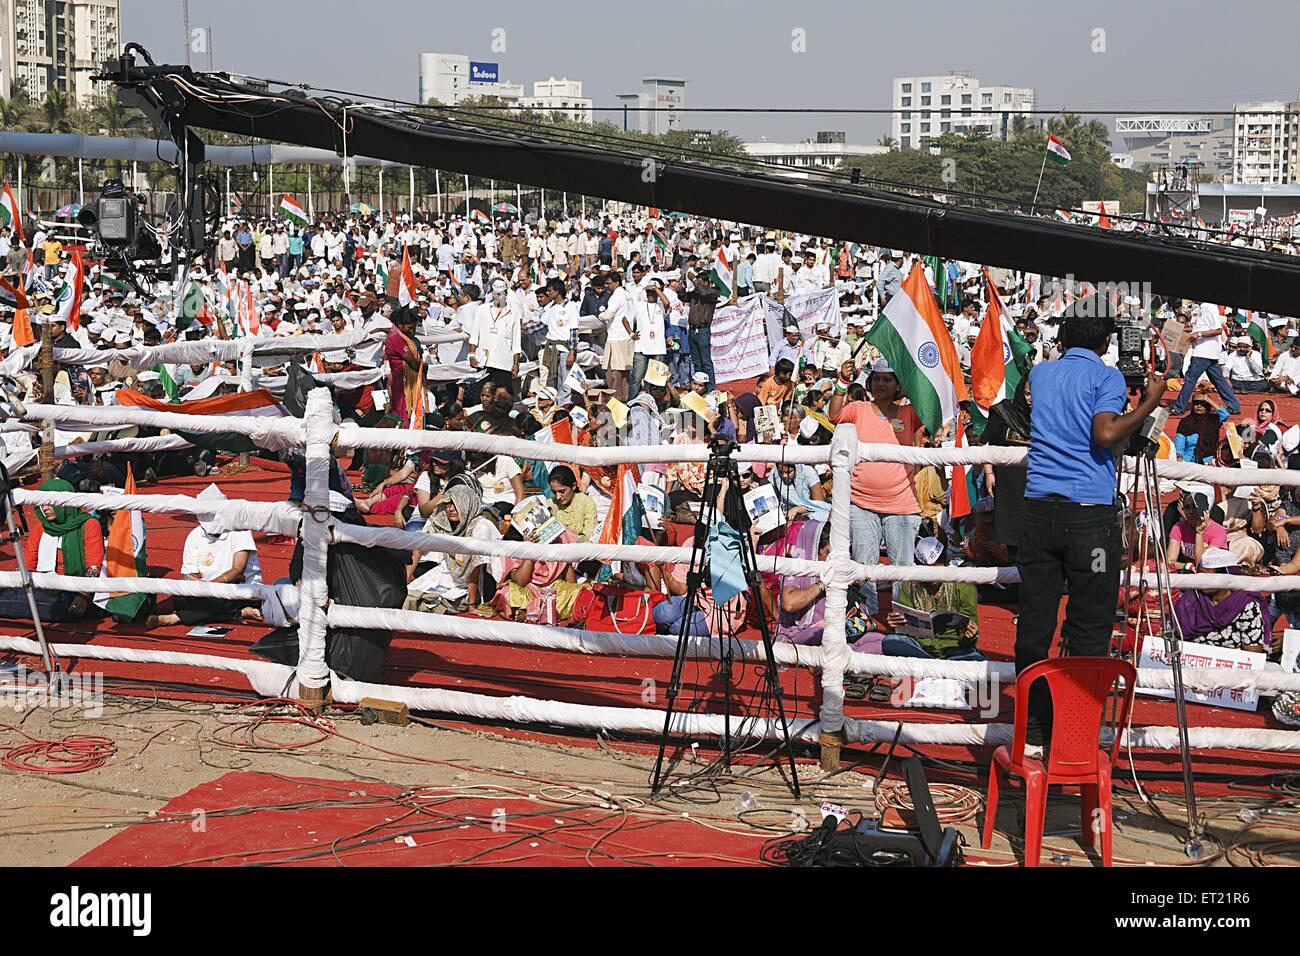 Video Camera Mounted on Crane Coverage Crowd Mumbai Maharashtra India Asia Dec 2011 - Stock Image